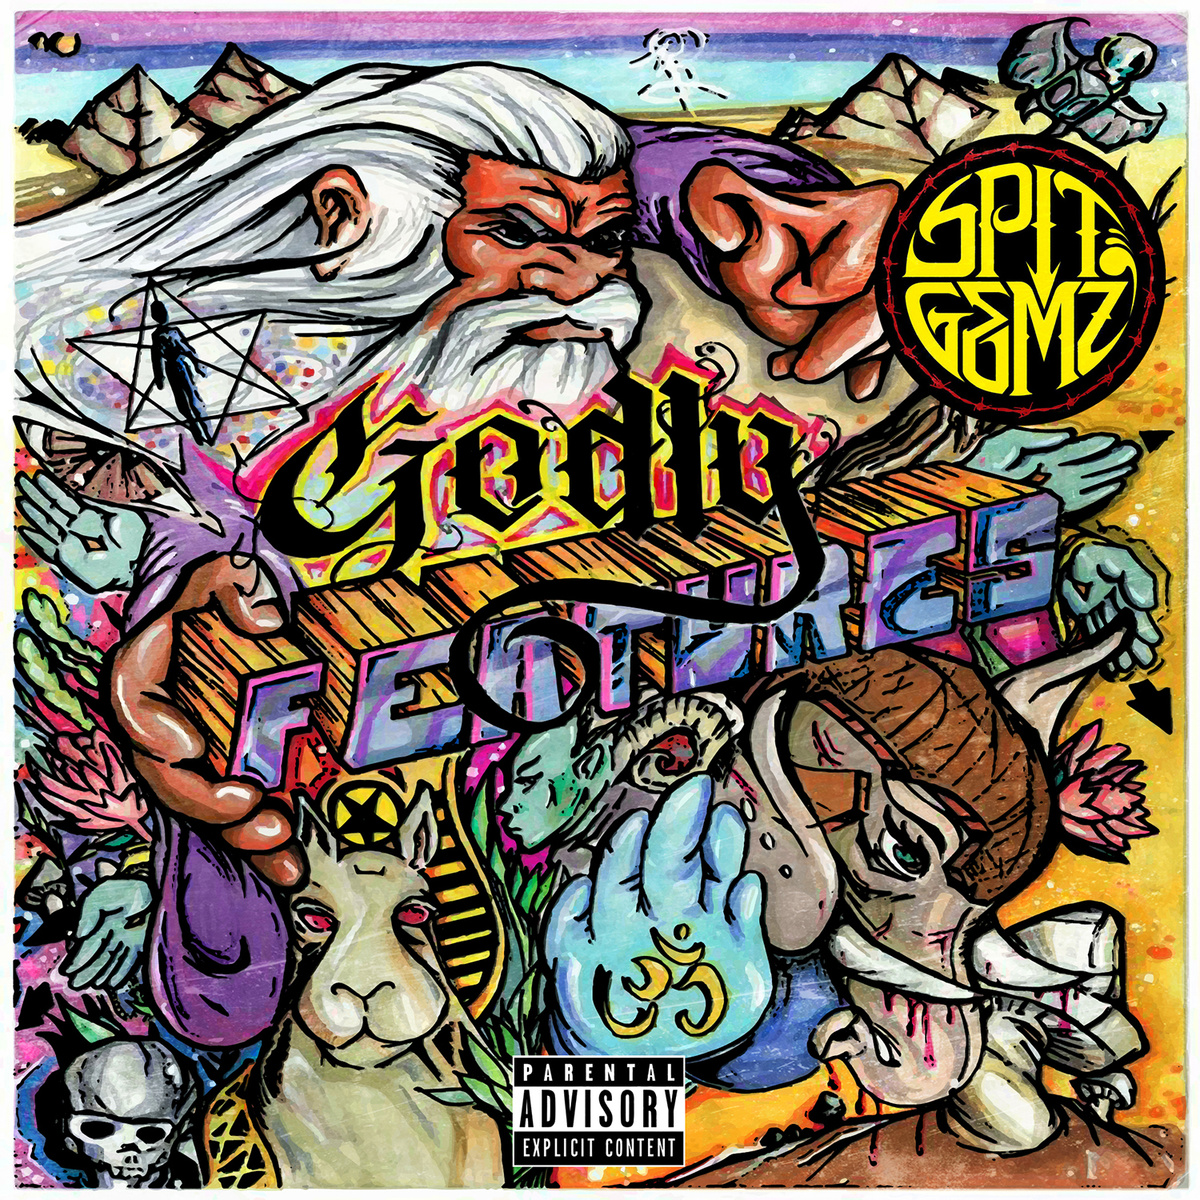 SPIT GEMZ – GODLY FEATURES LP Review